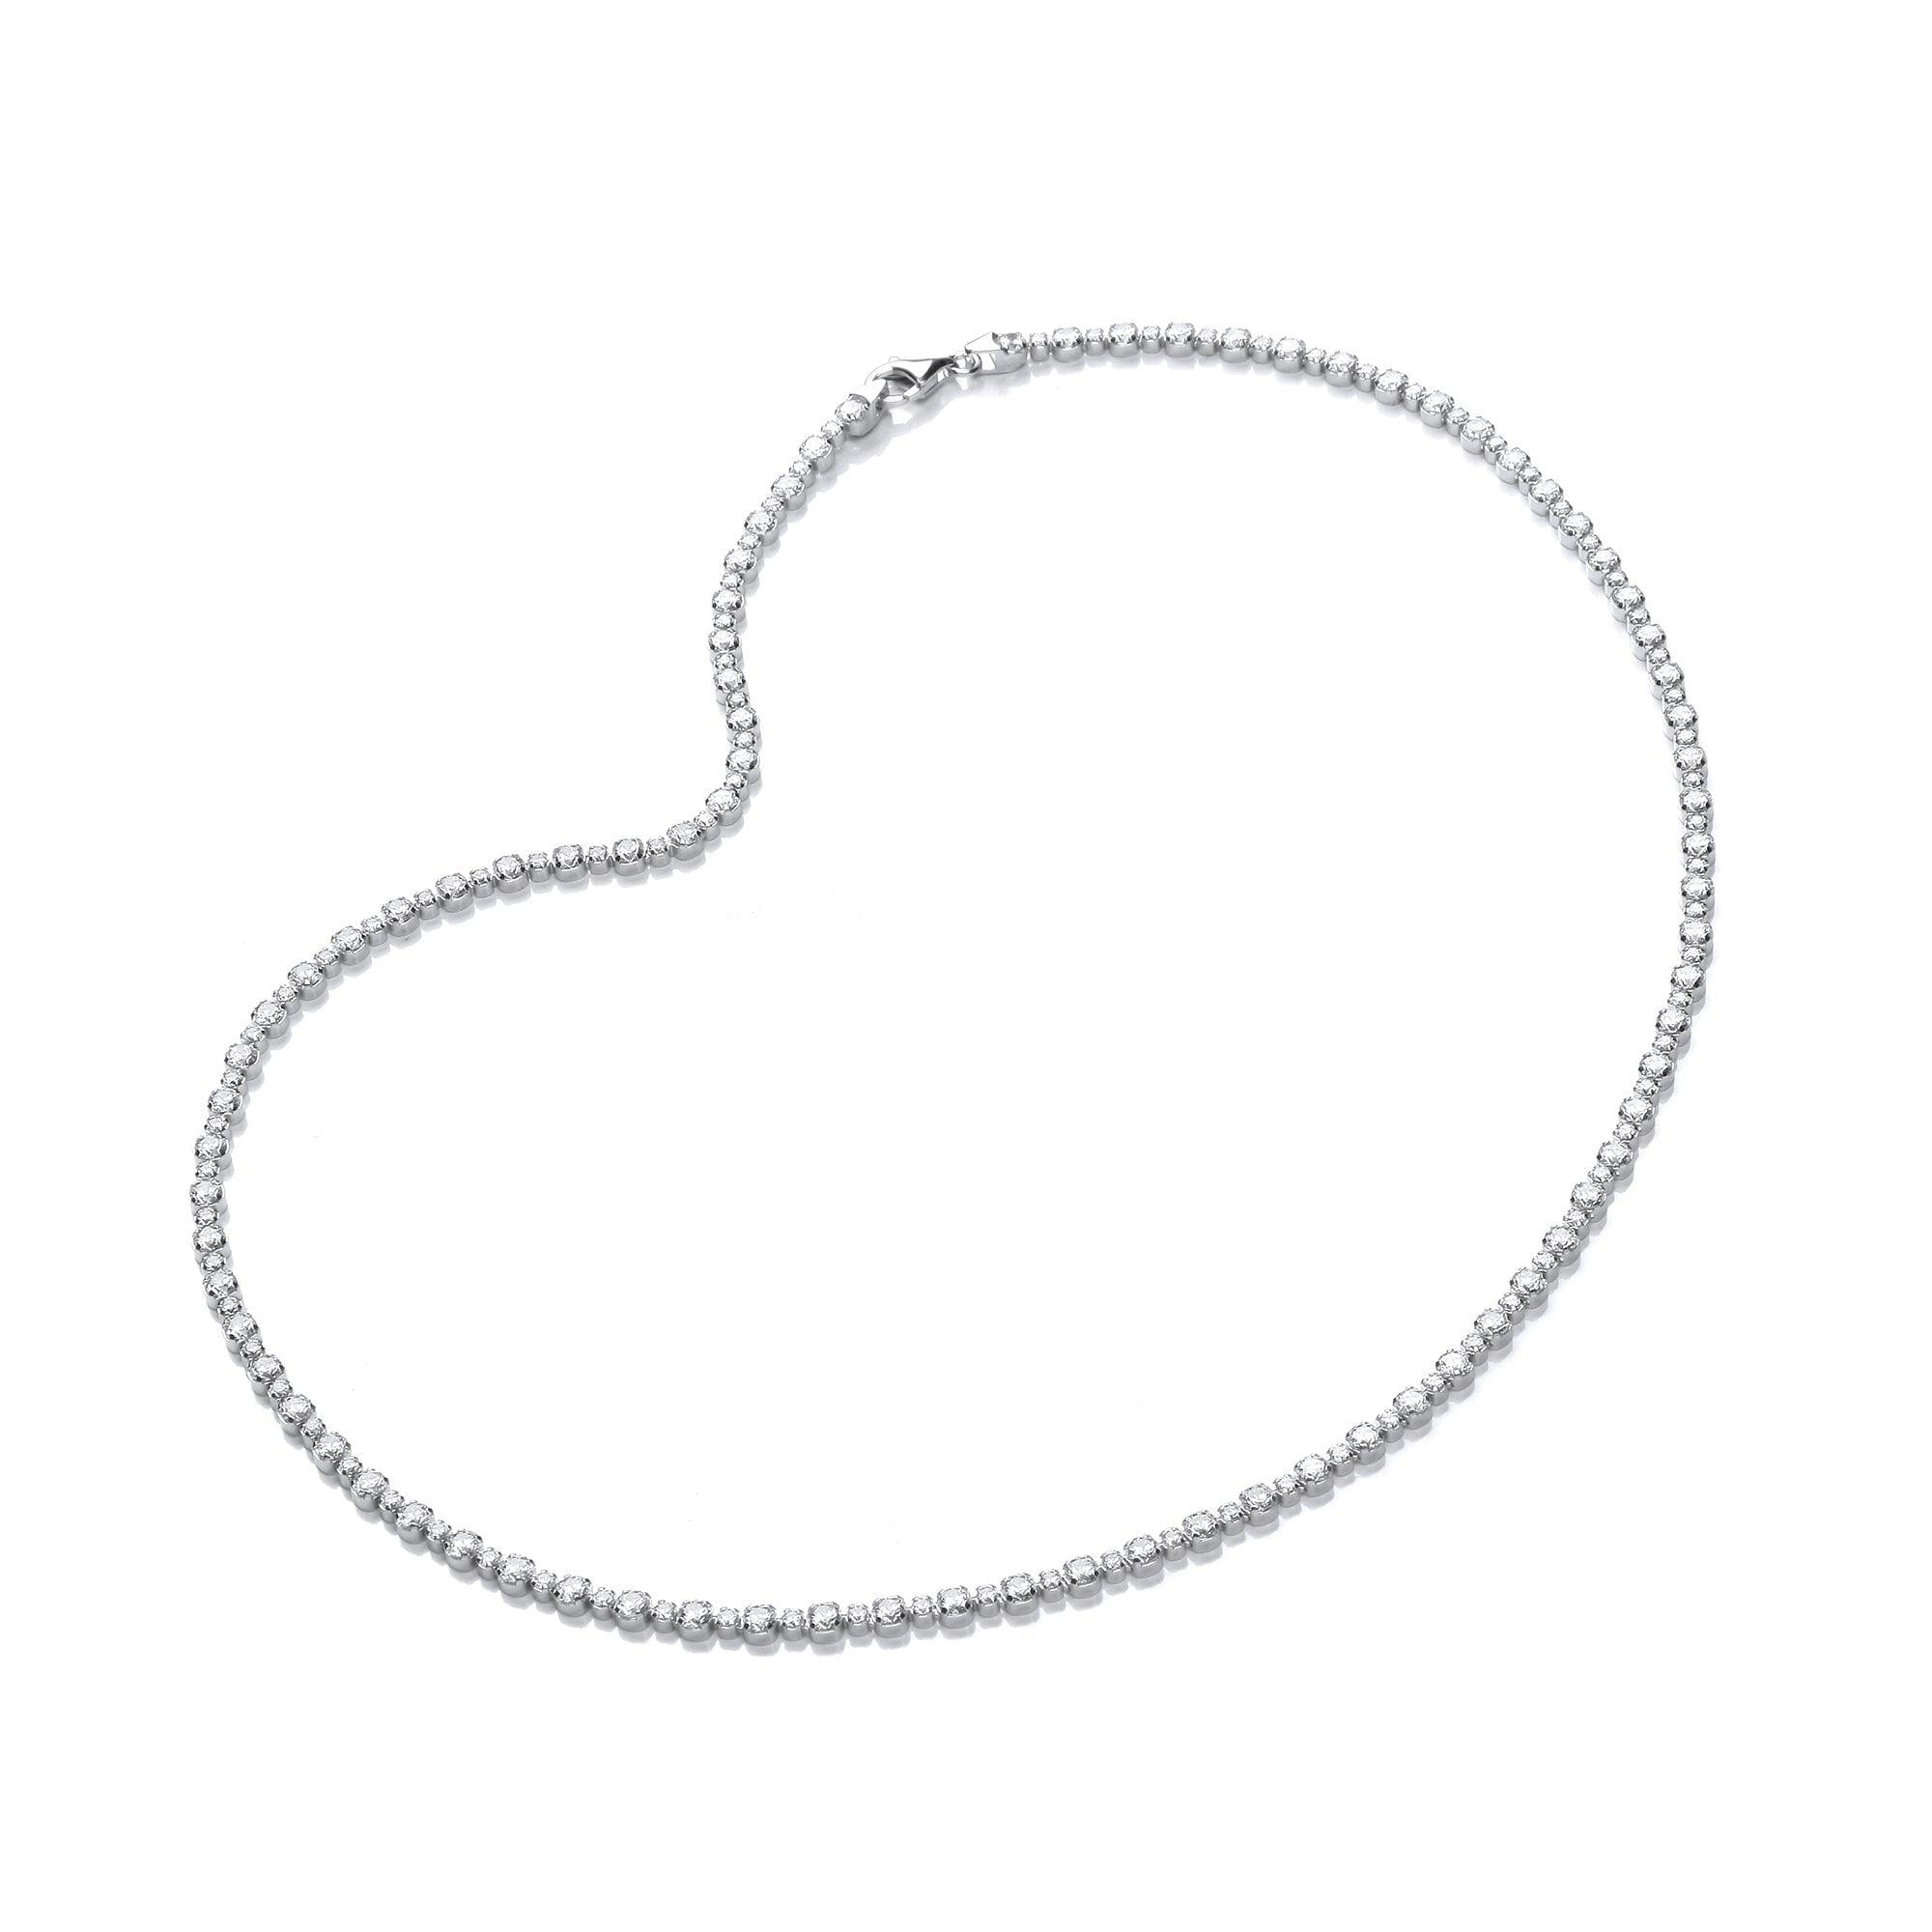 Sterling Silver Tennis Necklace Swarovski Zirconia Fine Tennis Necklace